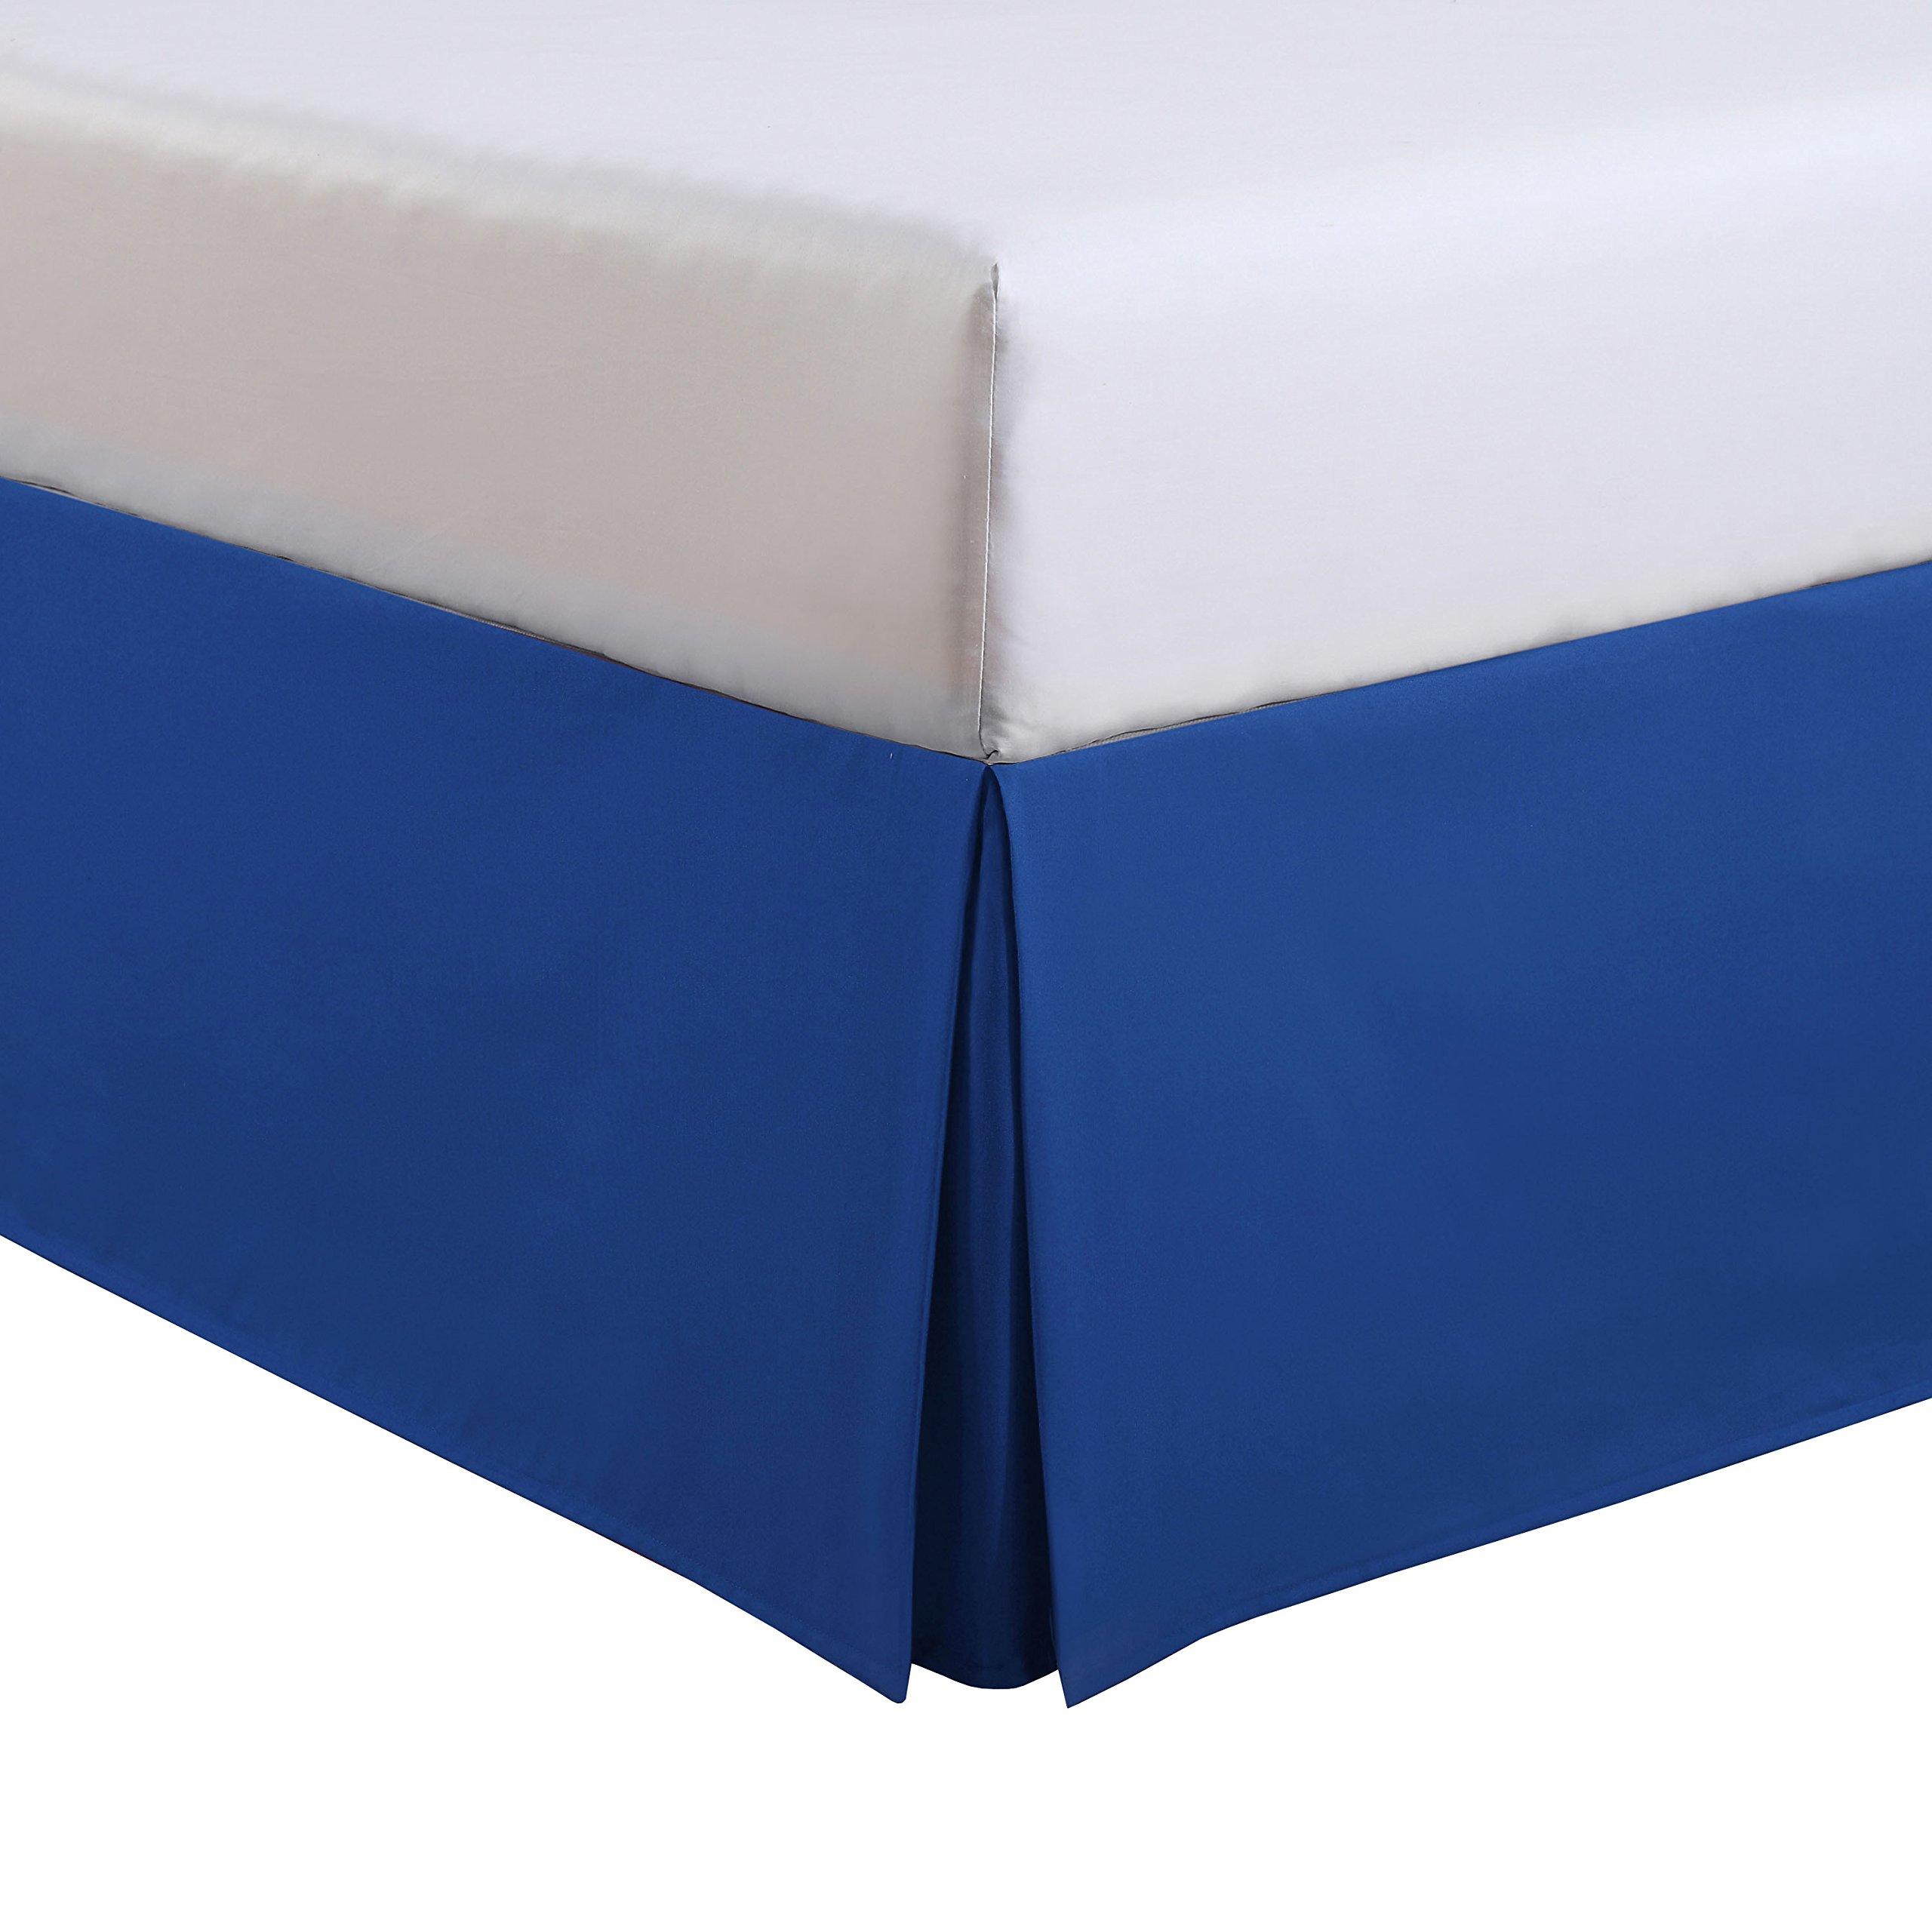 Fresh Ideas Kids Full Bed Skirt - Lux Hotel Tailored Microfiber Bedskirt, Classic 14'' Drop Length - Cobalt Blue by Fresh Ideas